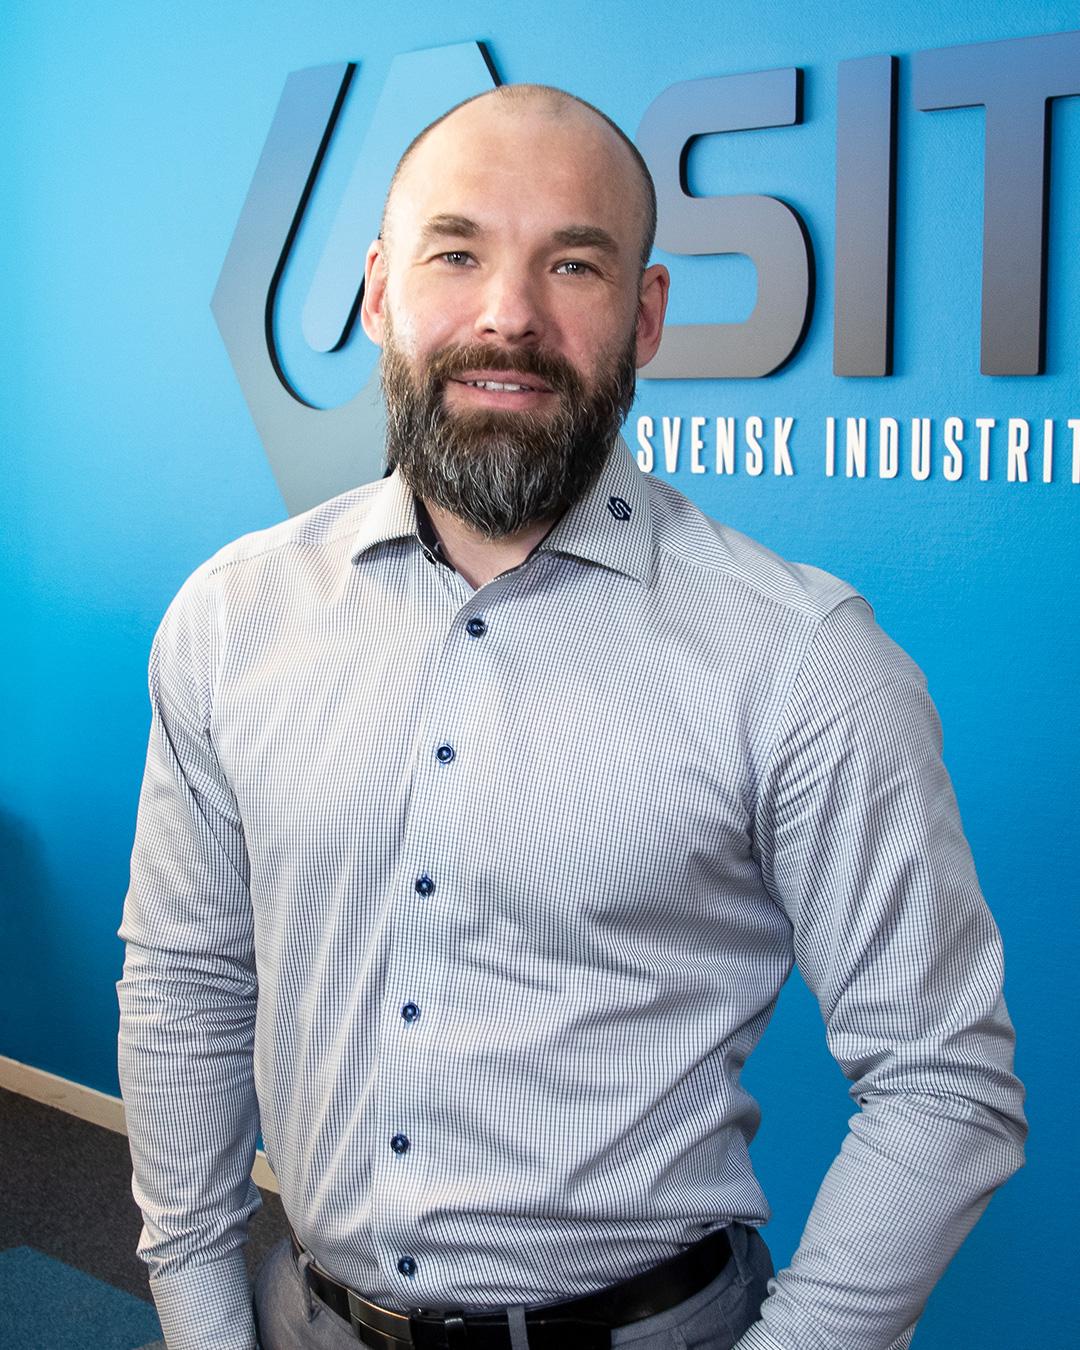 Pressbild på Fredrik Kroll VD på SITE Svensk Industriteknik